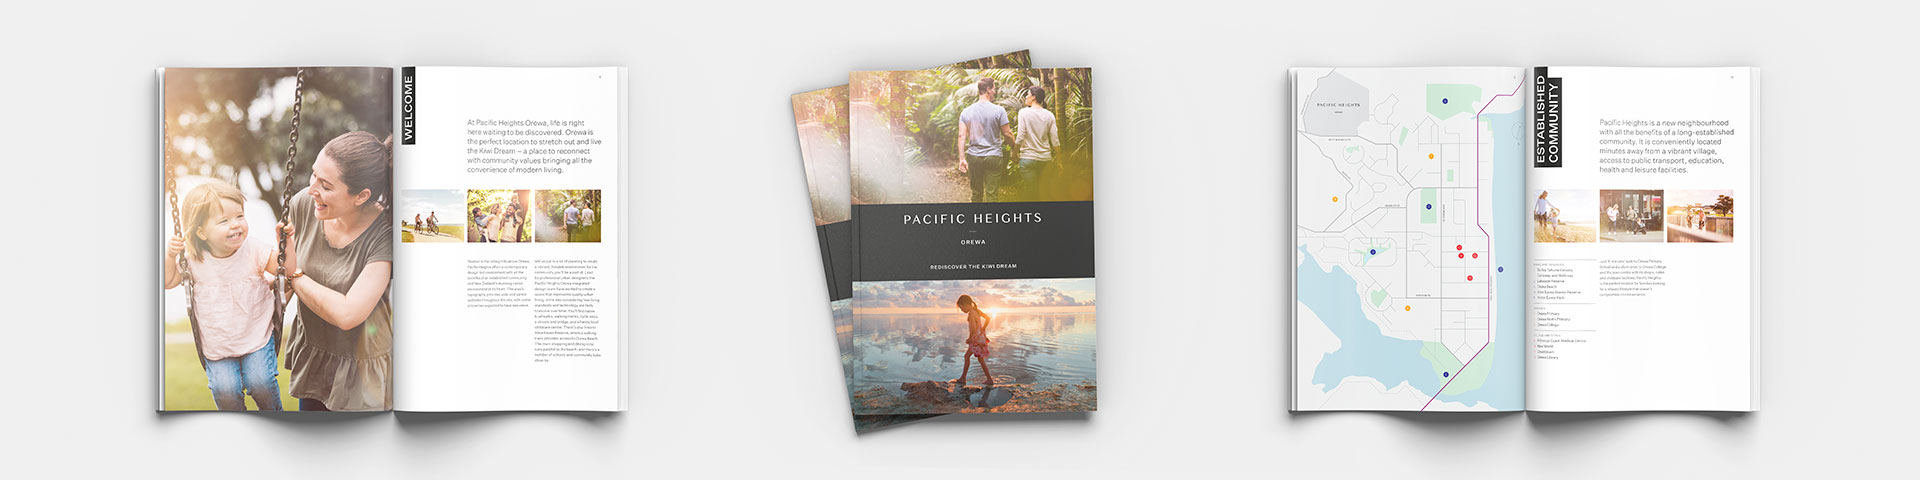 Pacific Heights Orewa